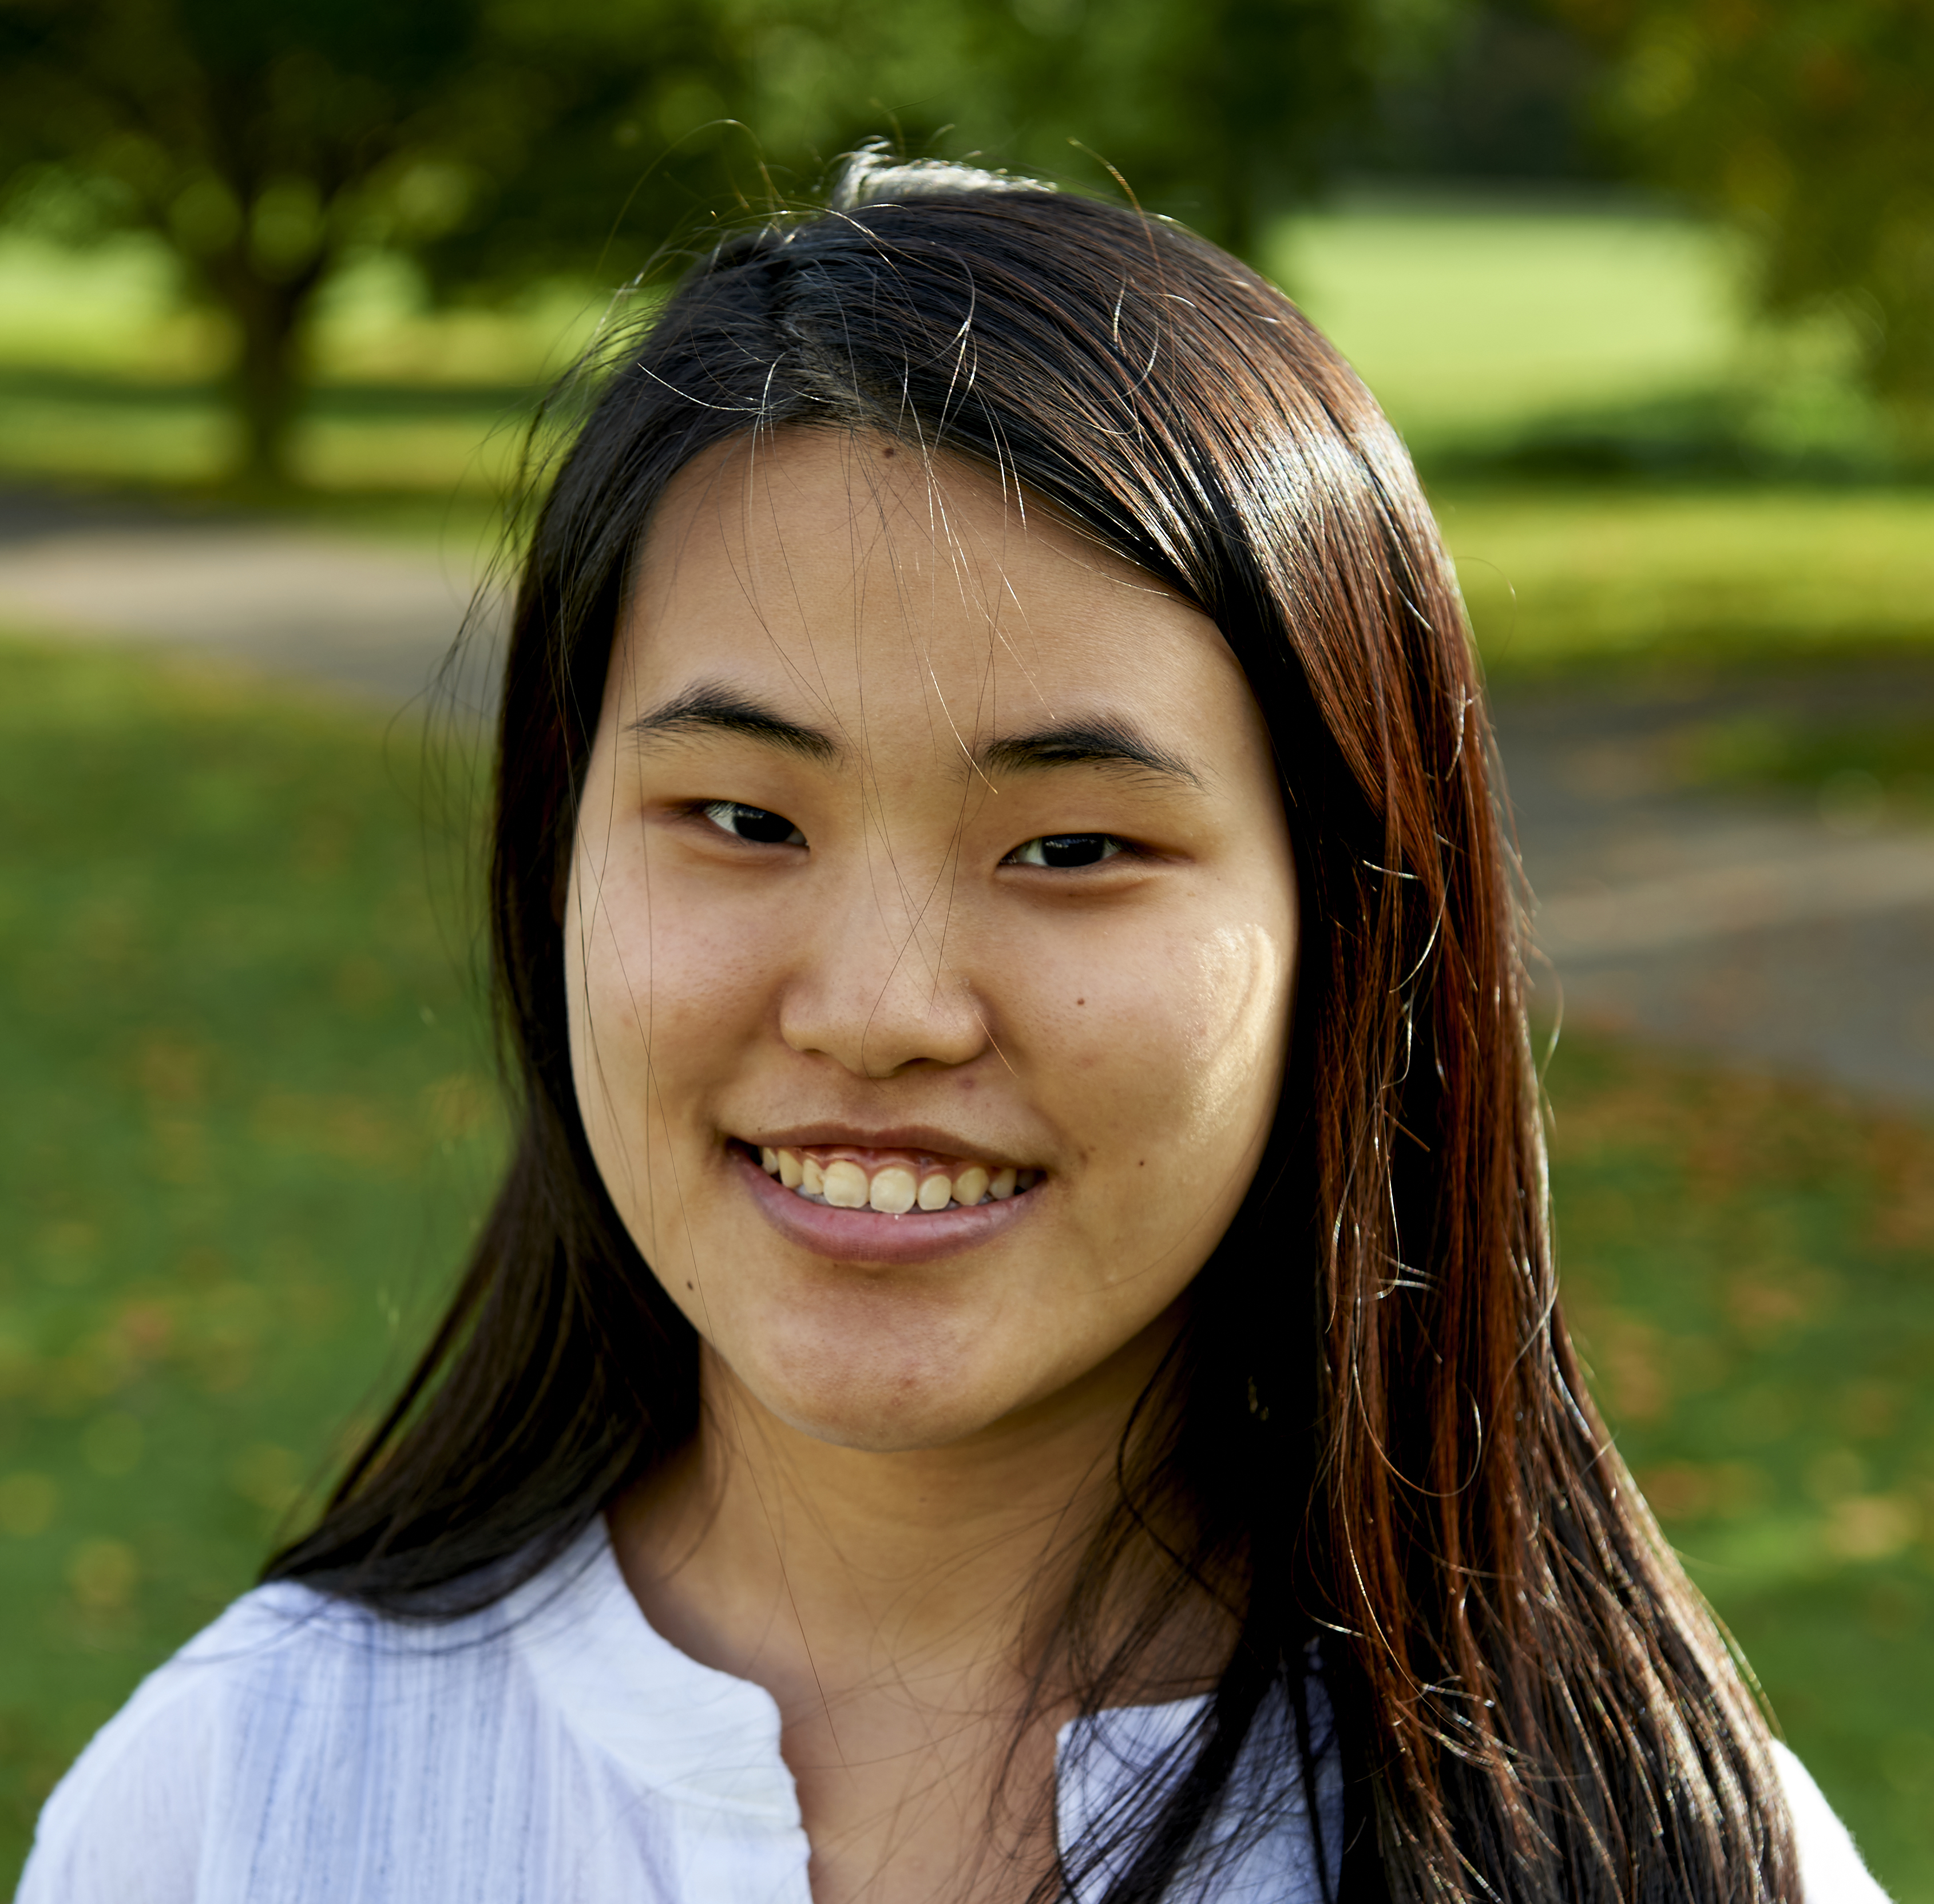 INTO UEA student Gina, from South Korea